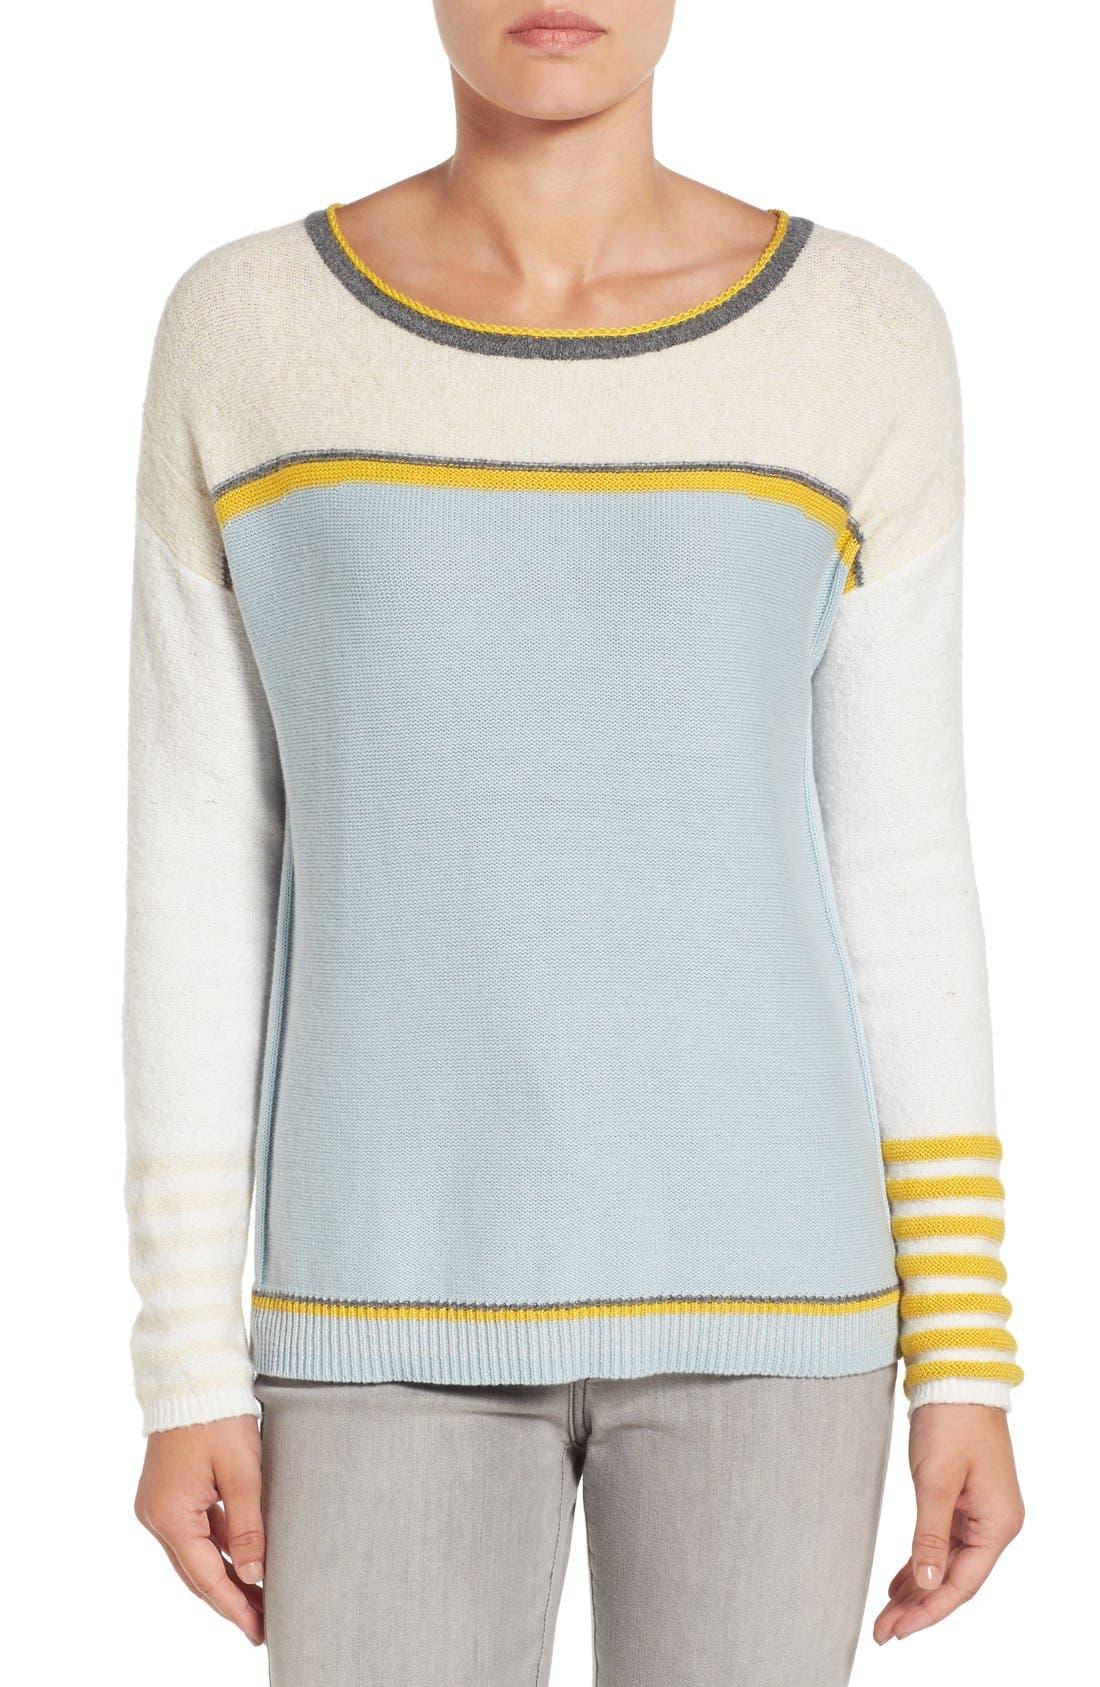 Alternate Image 1 Selected - Caslon® Button Back Sweater (Regular & Petite)